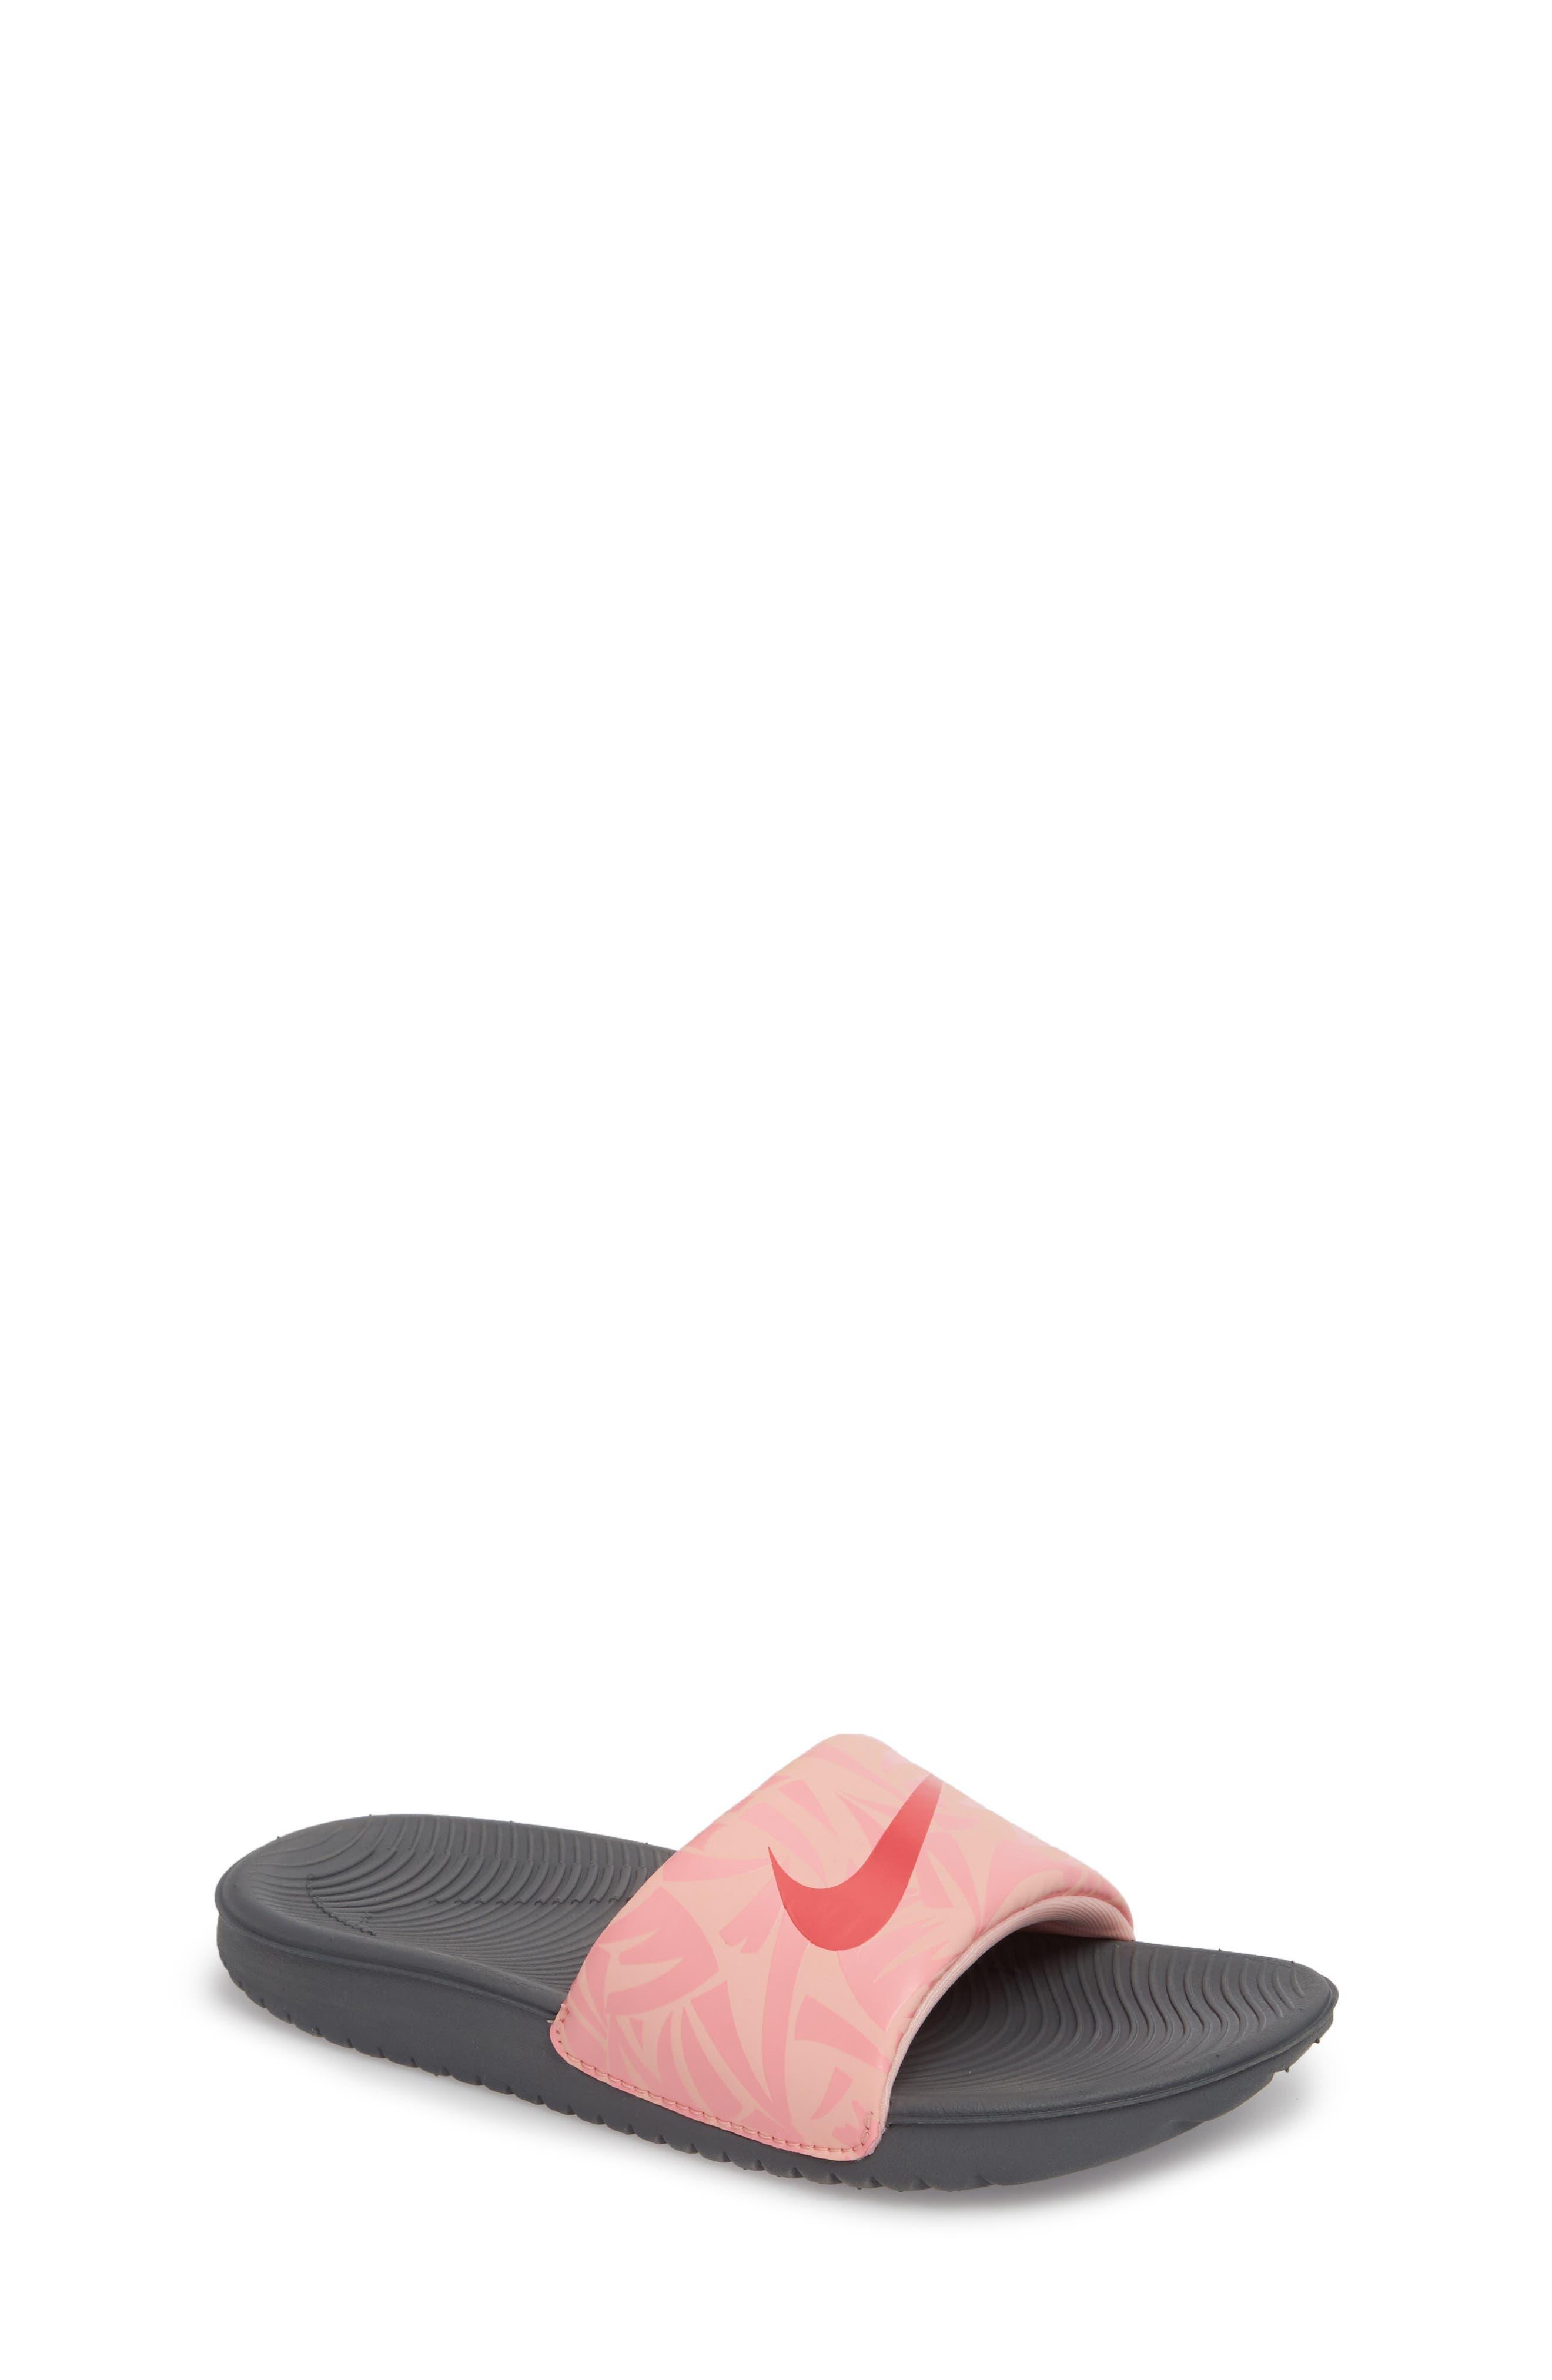 'Kawa' Print Slide Sandal,                         Main,                         color, Grey/ Tropical Pink/ Coral